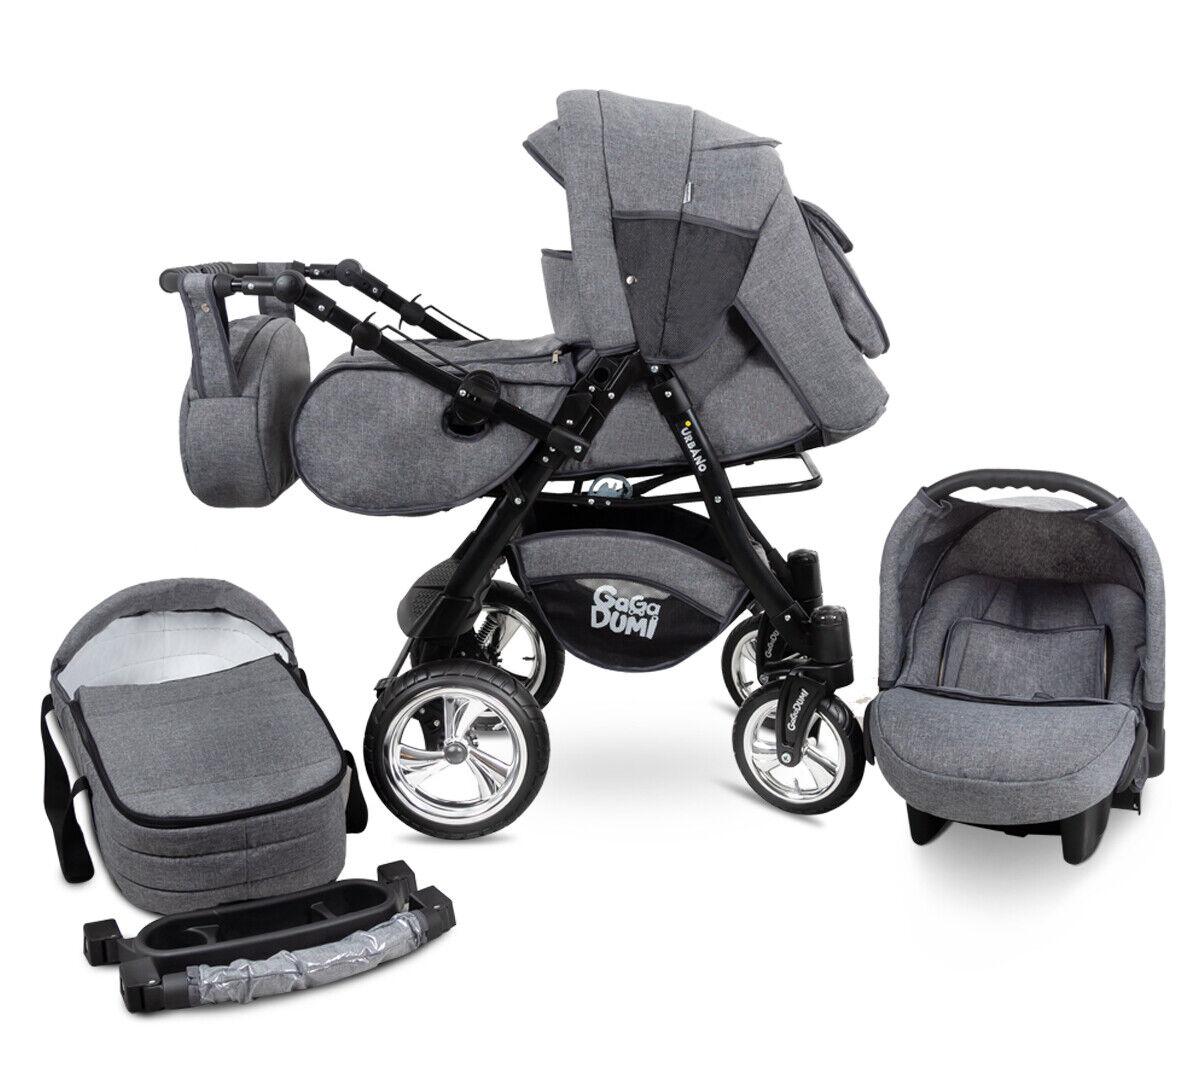 Urbano GaGaDumi Travel System 3in1 Baby Pram Car seat Pushchair Buggy